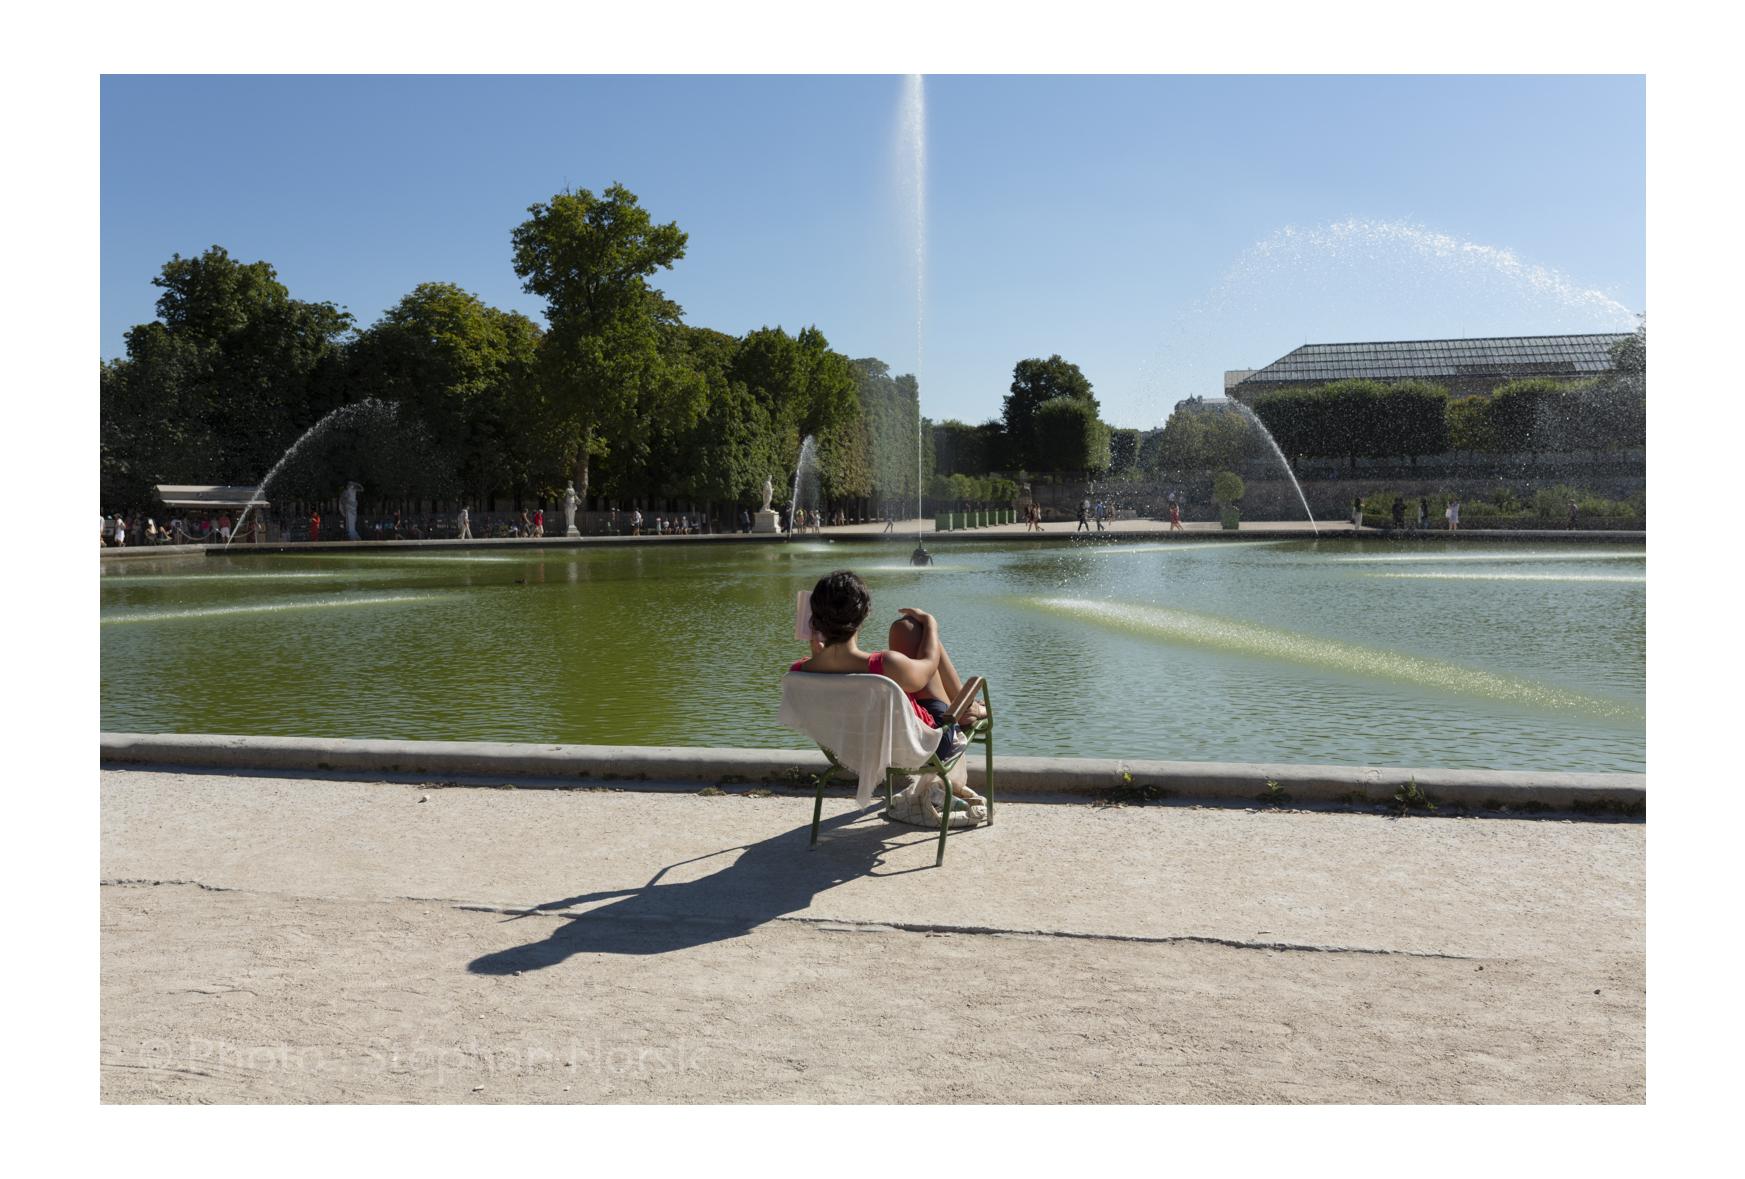 Stephan-Norsic-Paris-ok-1000-10